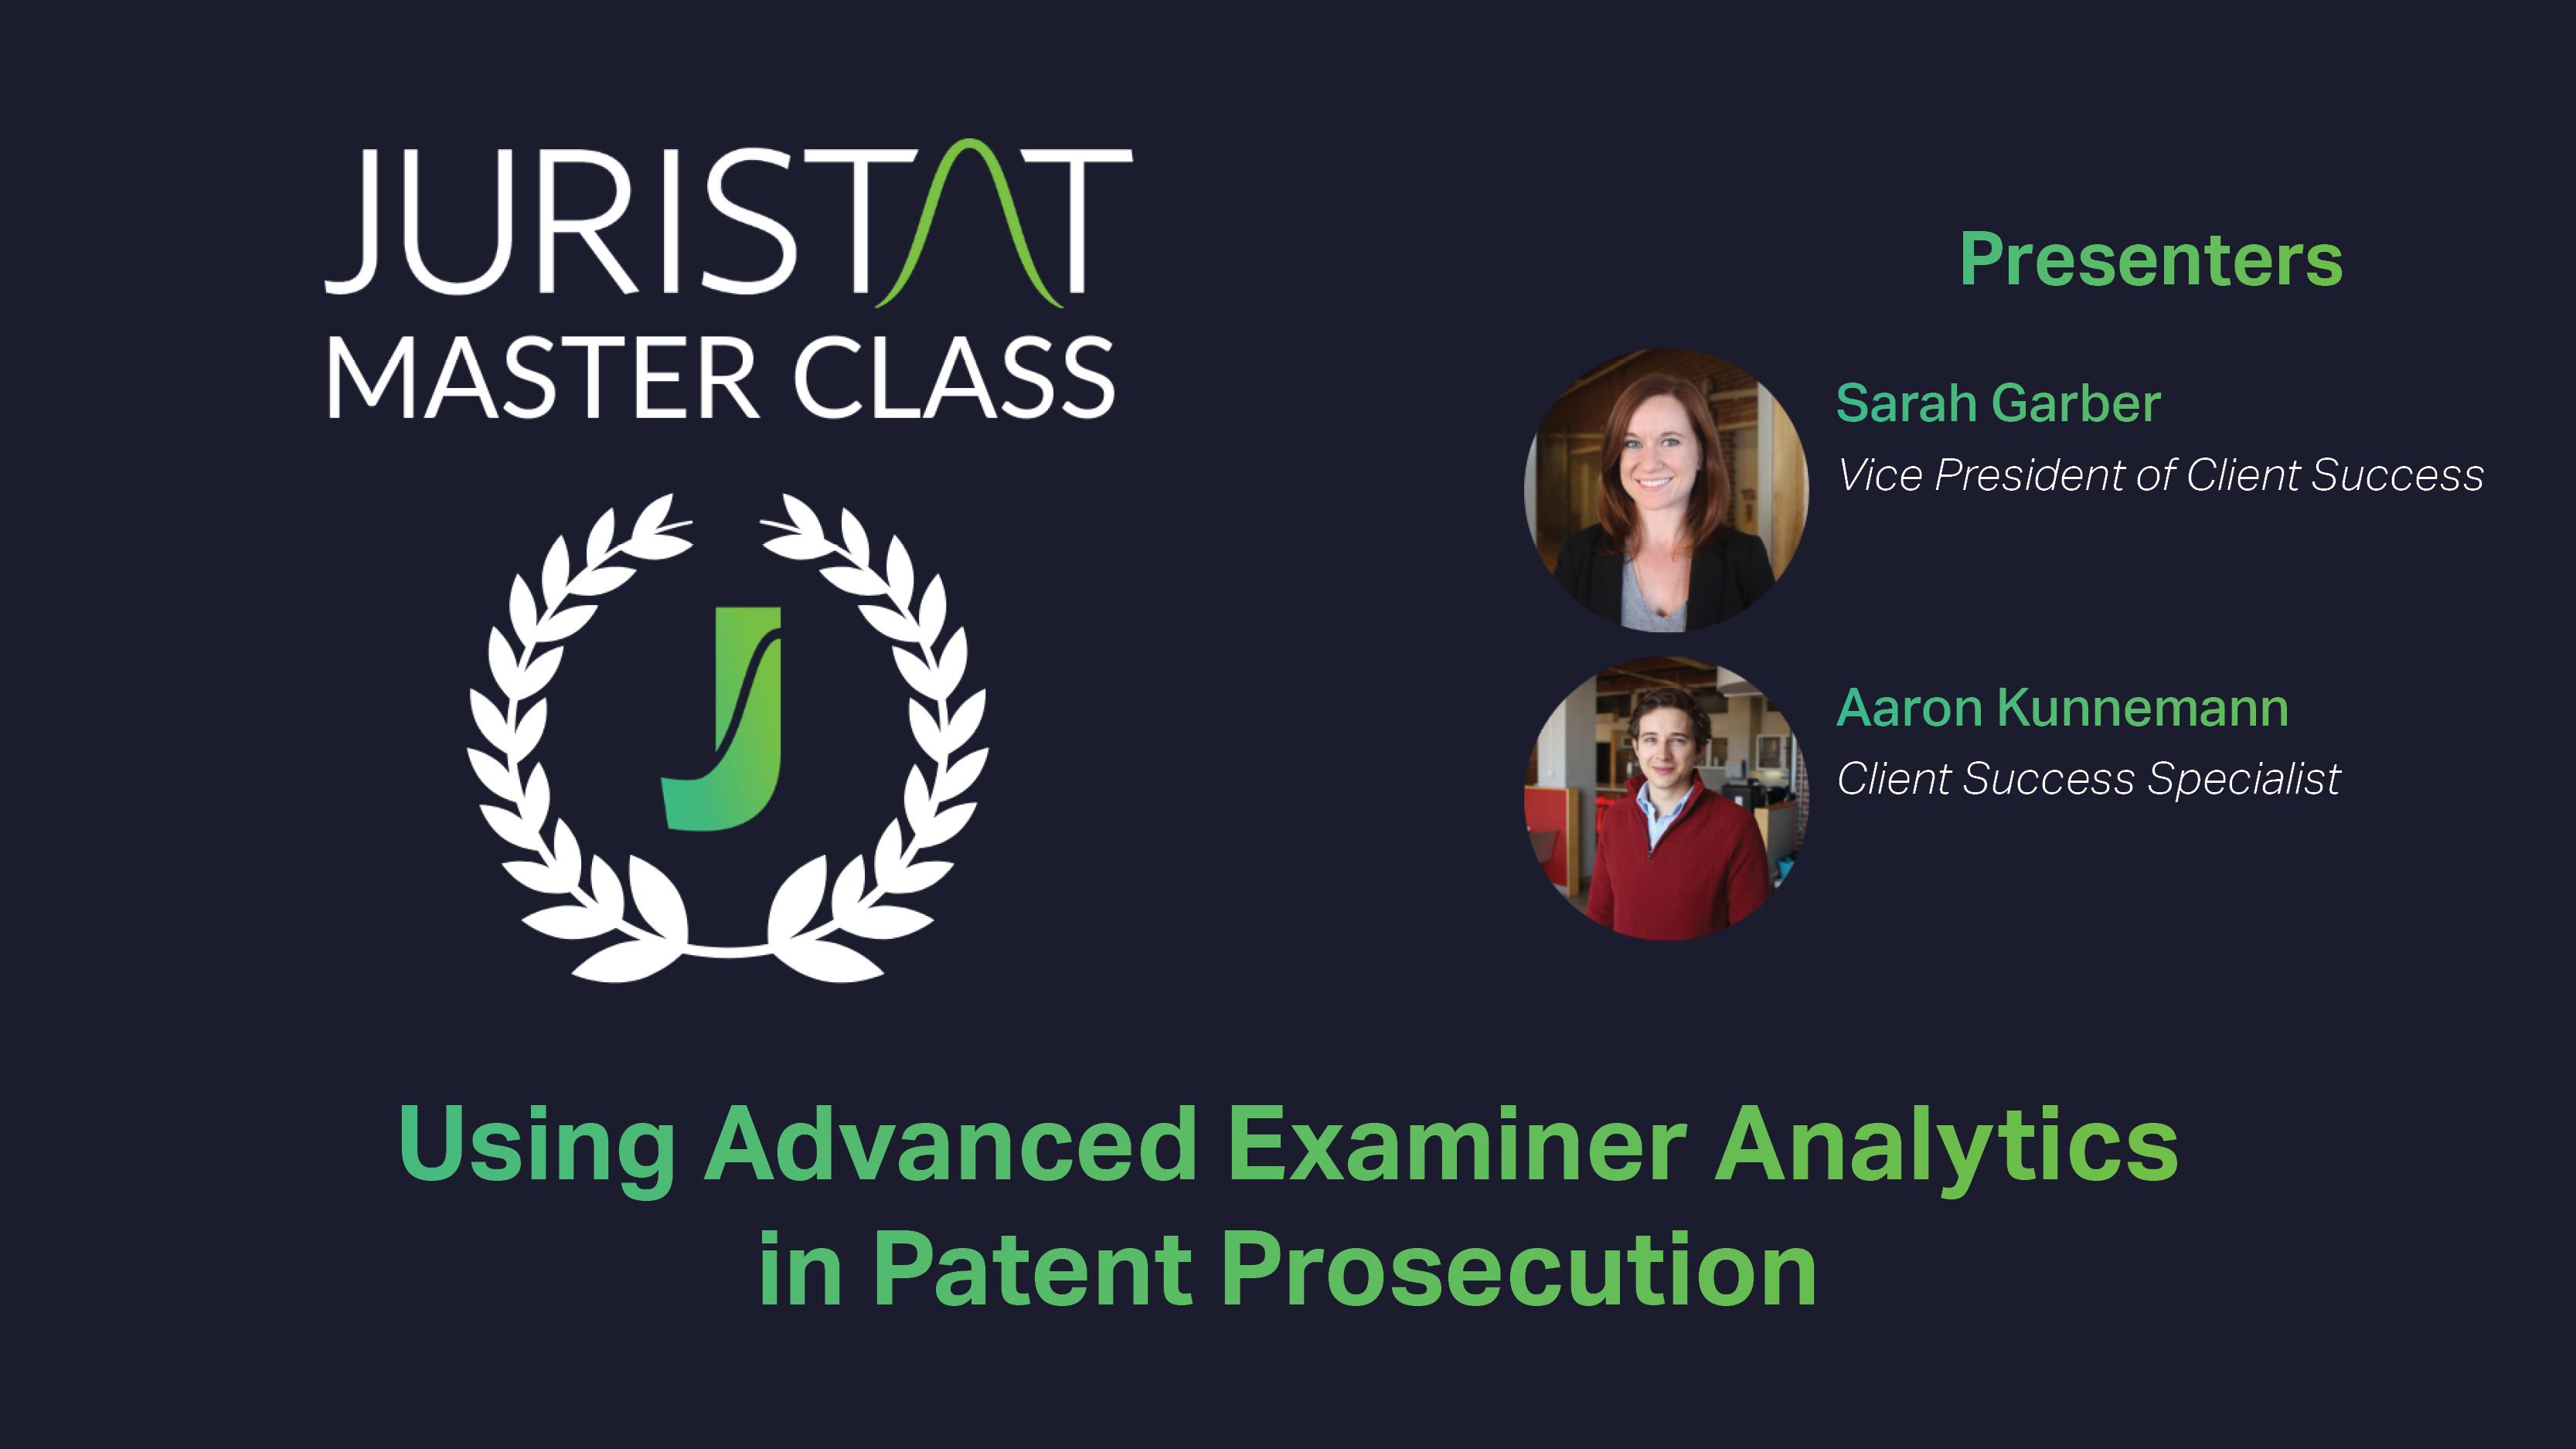 Advanced Examiner Analytics